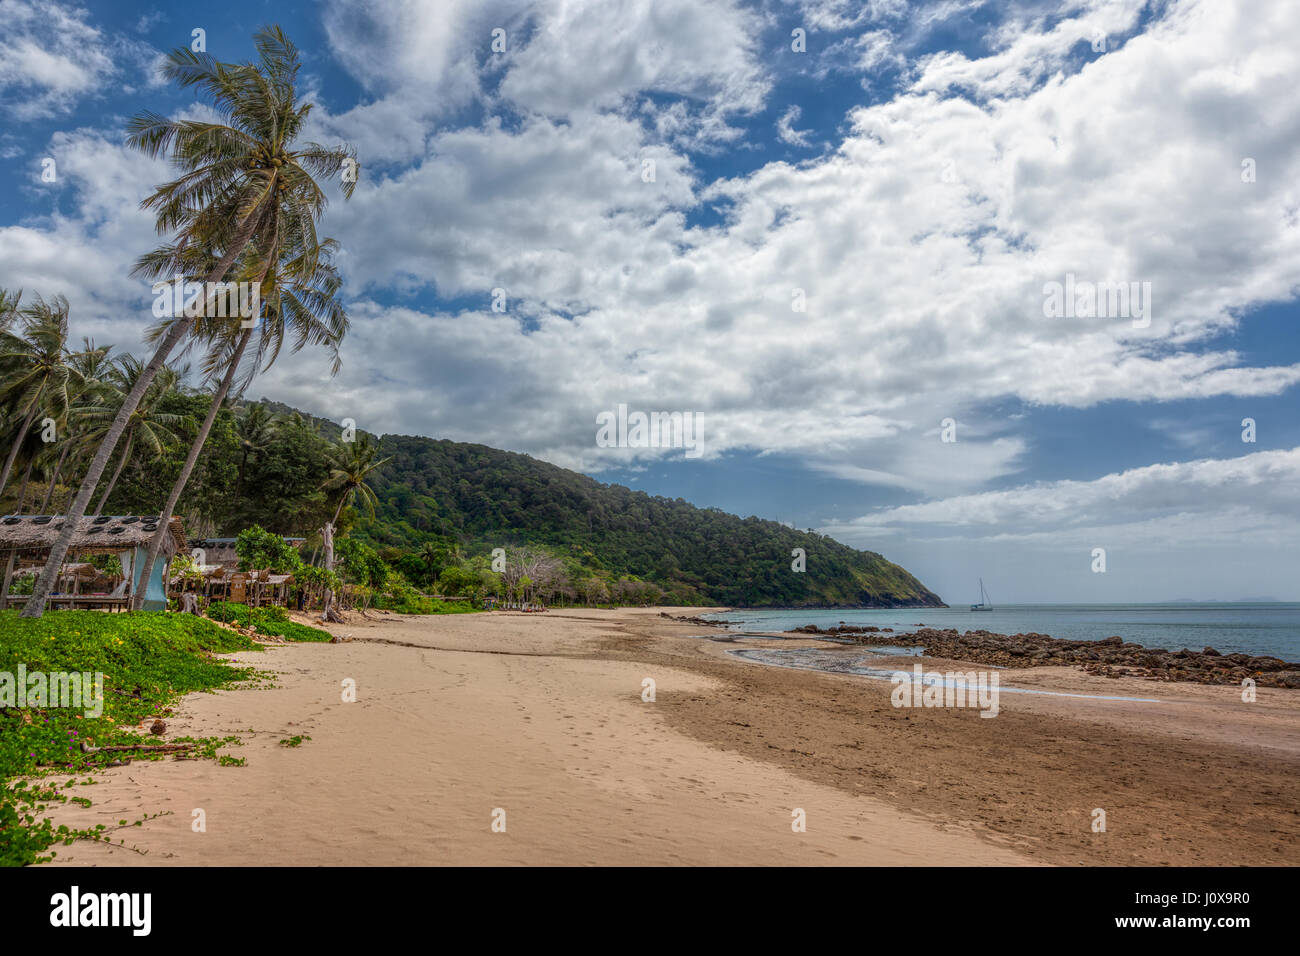 Bamboo Bay Beach in Koh Lanta Yai, Krabi Province, Thailand, Southeast Asia - Stock Image